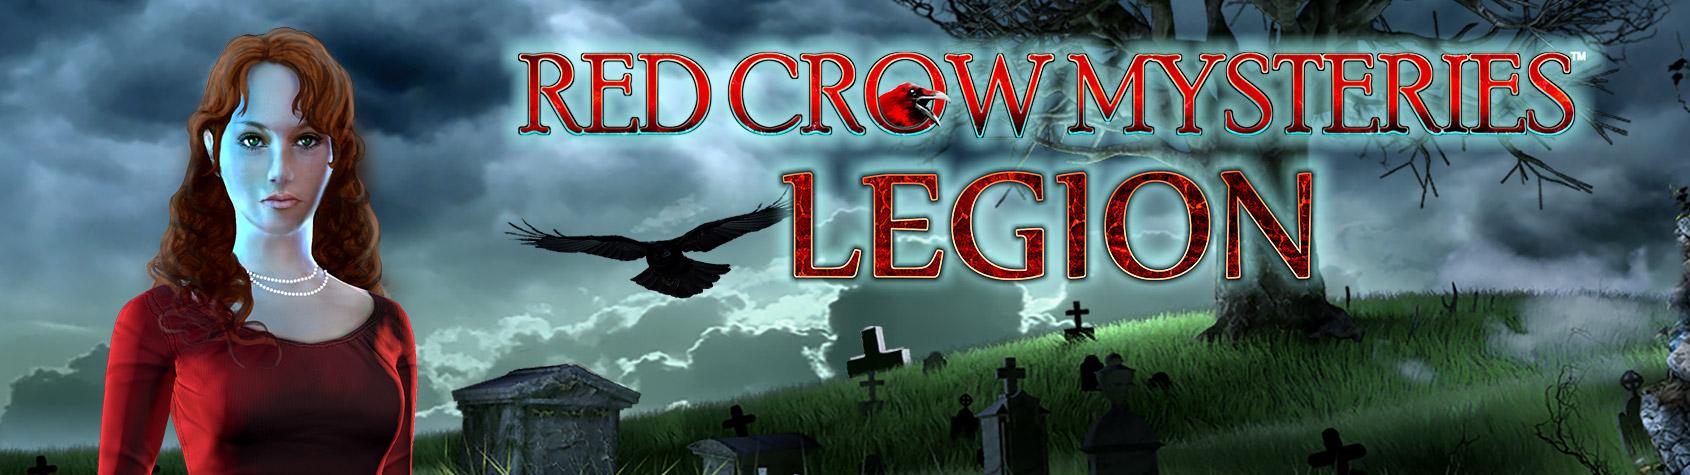 Red Crow Mysteries: Legion HD